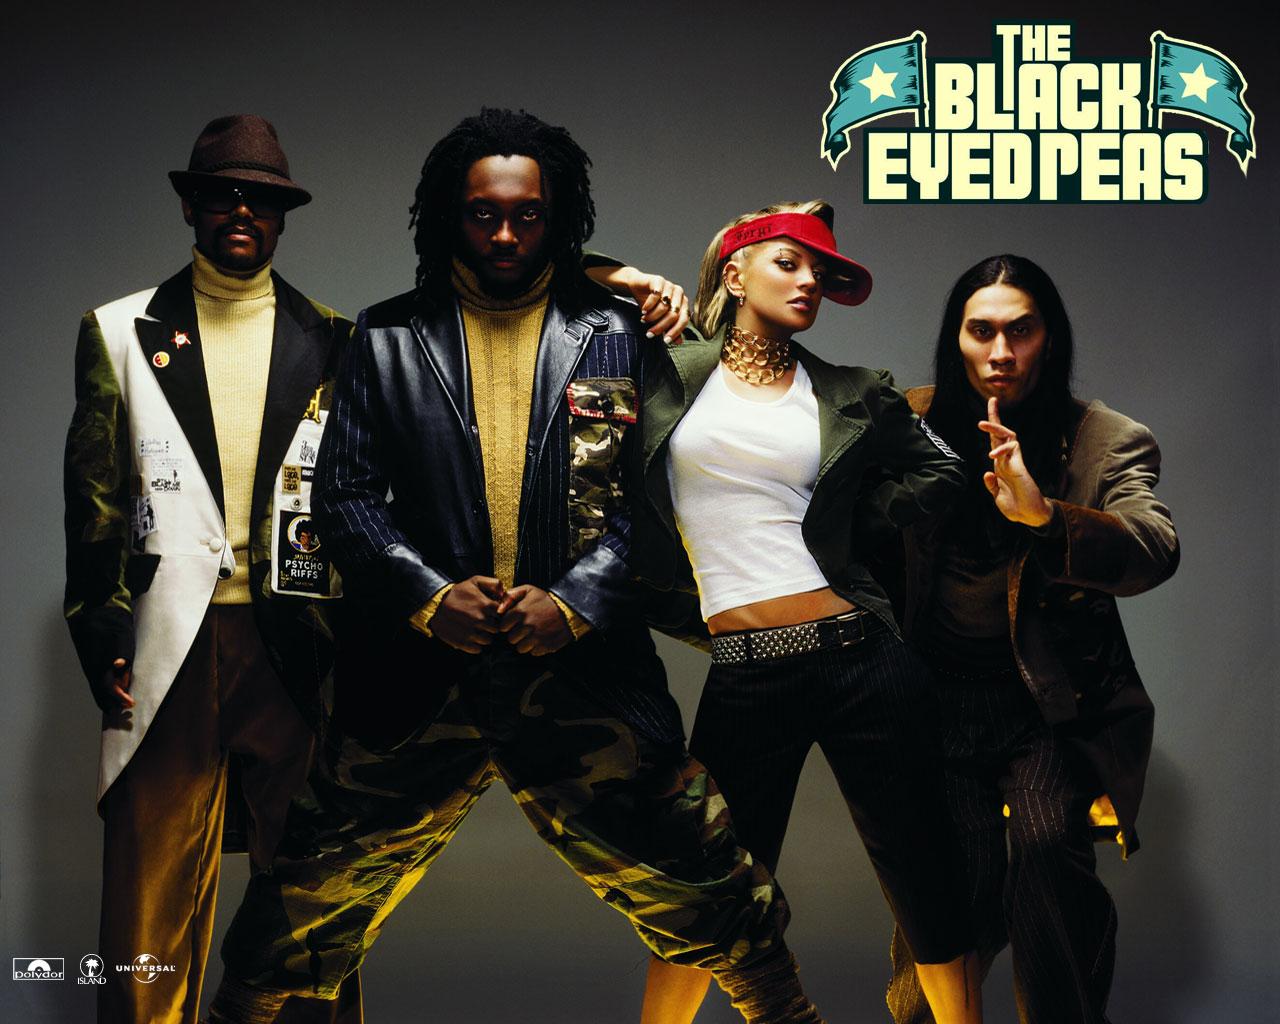 http://1.bp.blogspot.com/_n_5ZETSr6jc/TJKmw0R9kVI/AAAAAAAAAAM/Oc79MK5EcAM/s1600/The-Black-Eyed-Peas.jpg